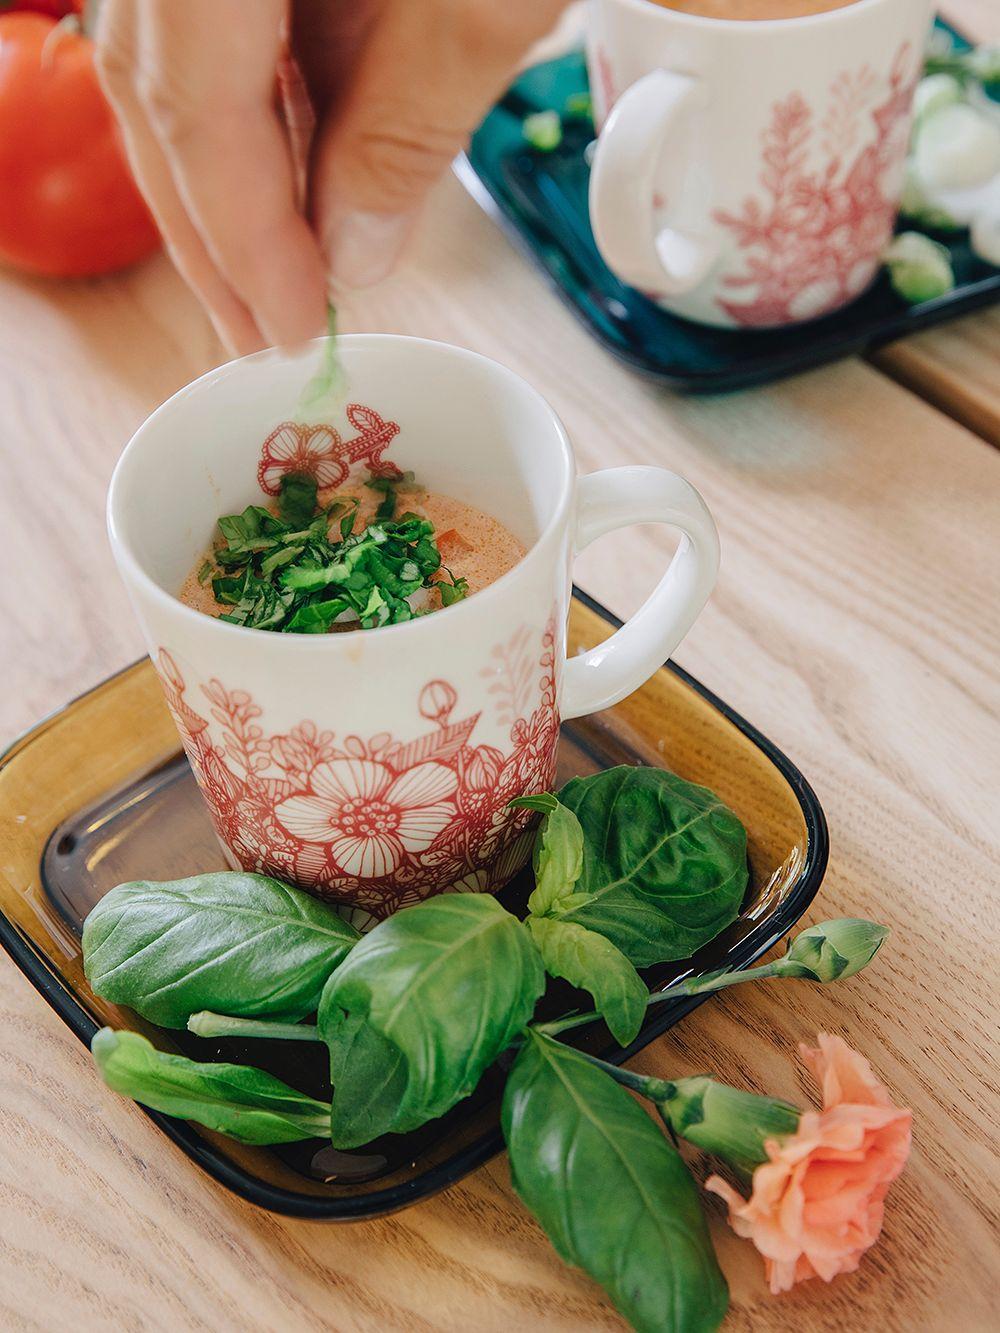 Ceramic artist Heini Riitahuhta's tomato soup